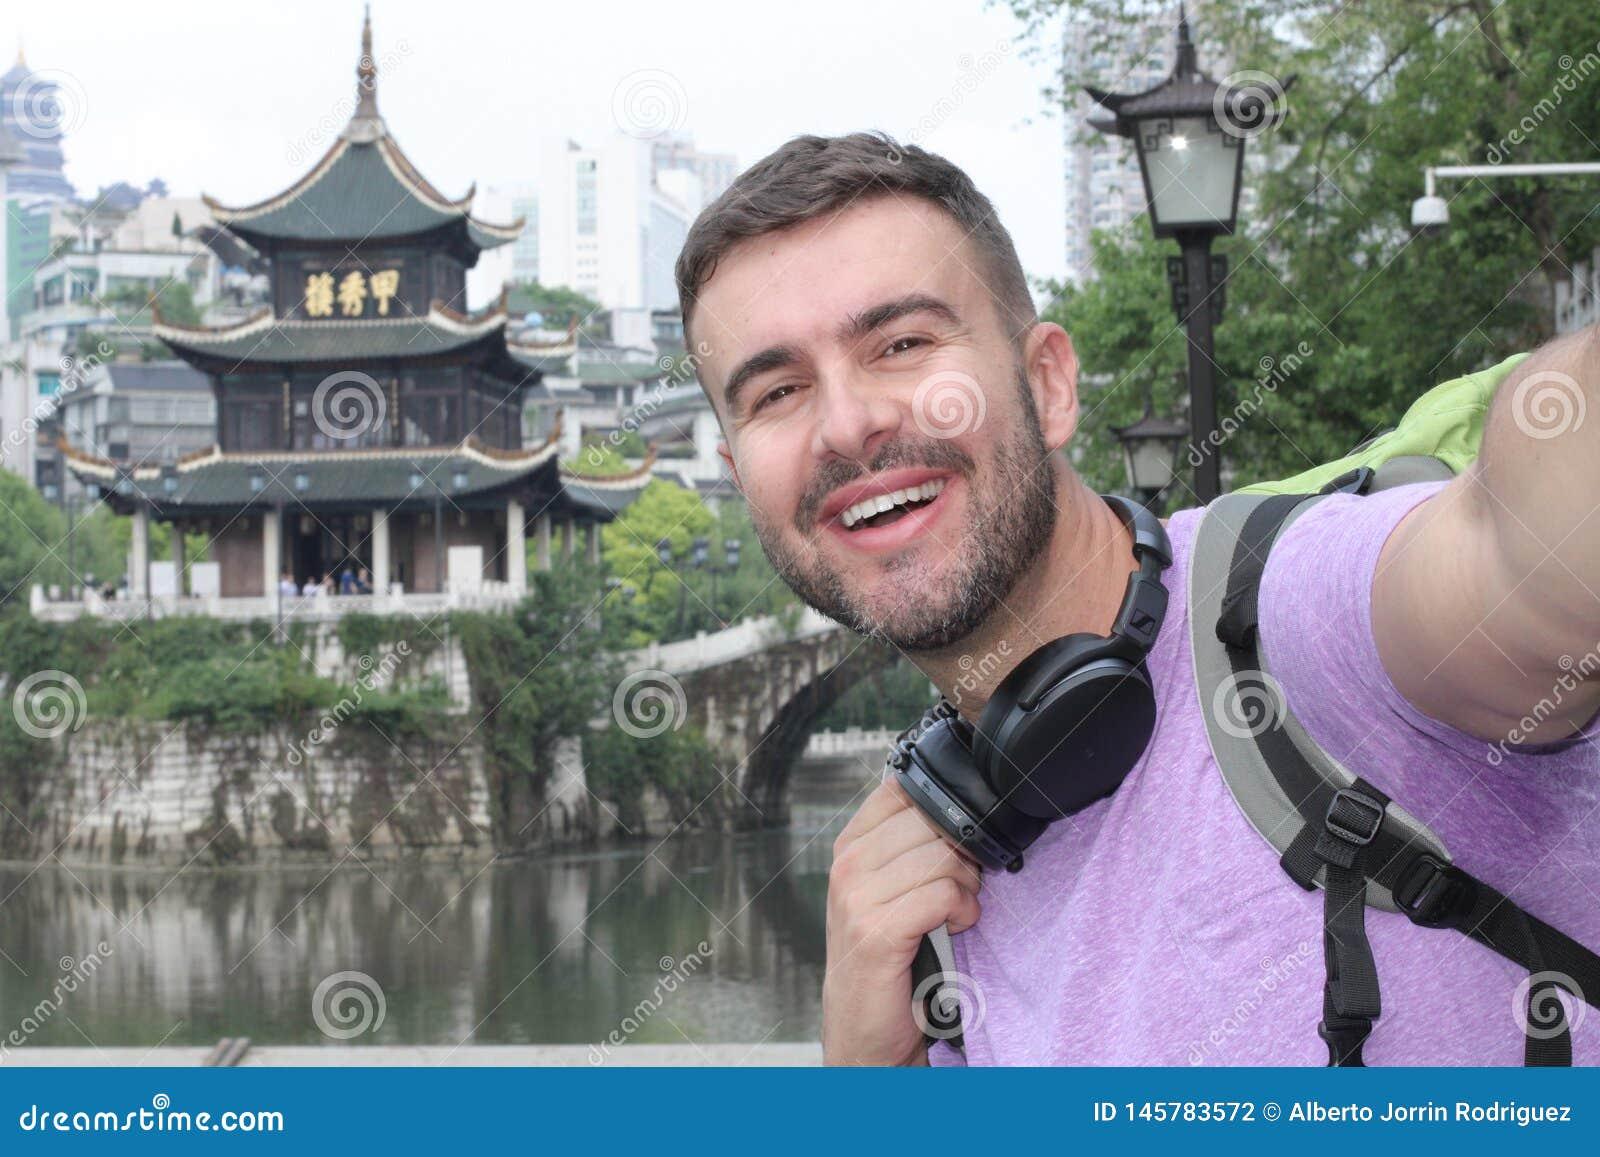 Kaukaski turysta w Guyiang, Chiny